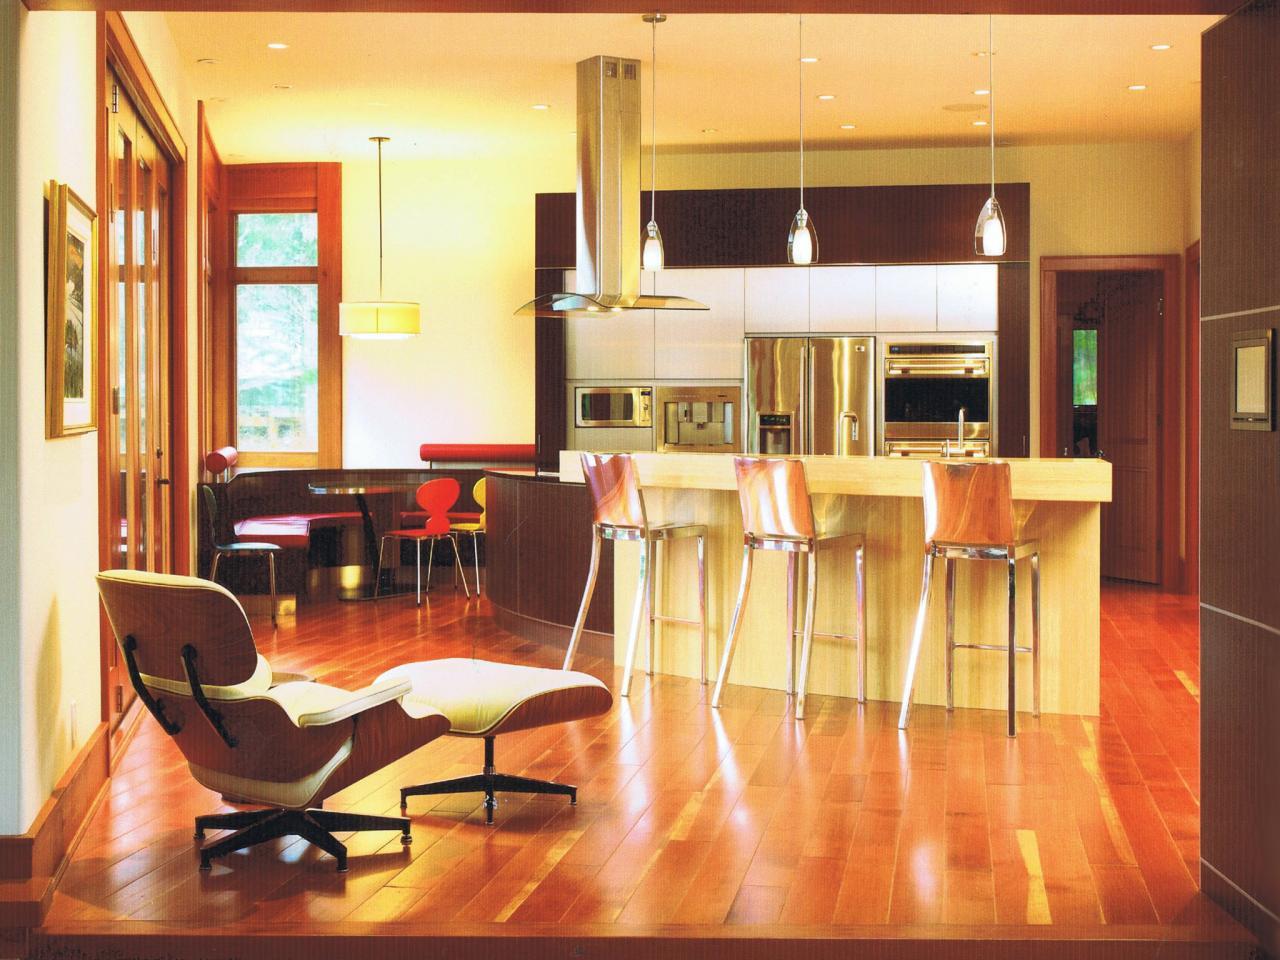 hgtv u shaped kitchen designs photo - 10